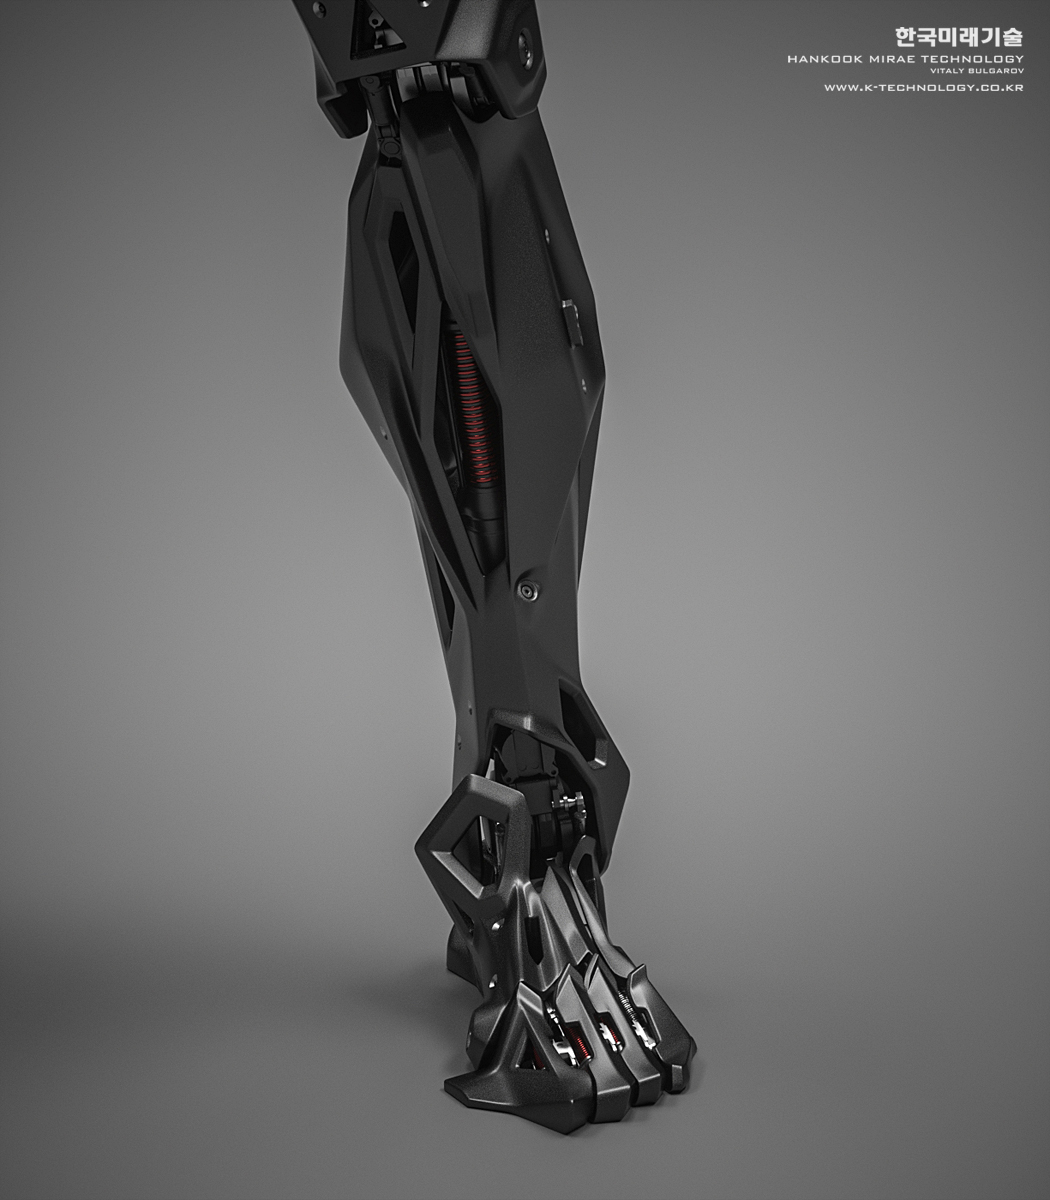 KFT_2.Xm_RobotDesign_ (26 of 29).jpg